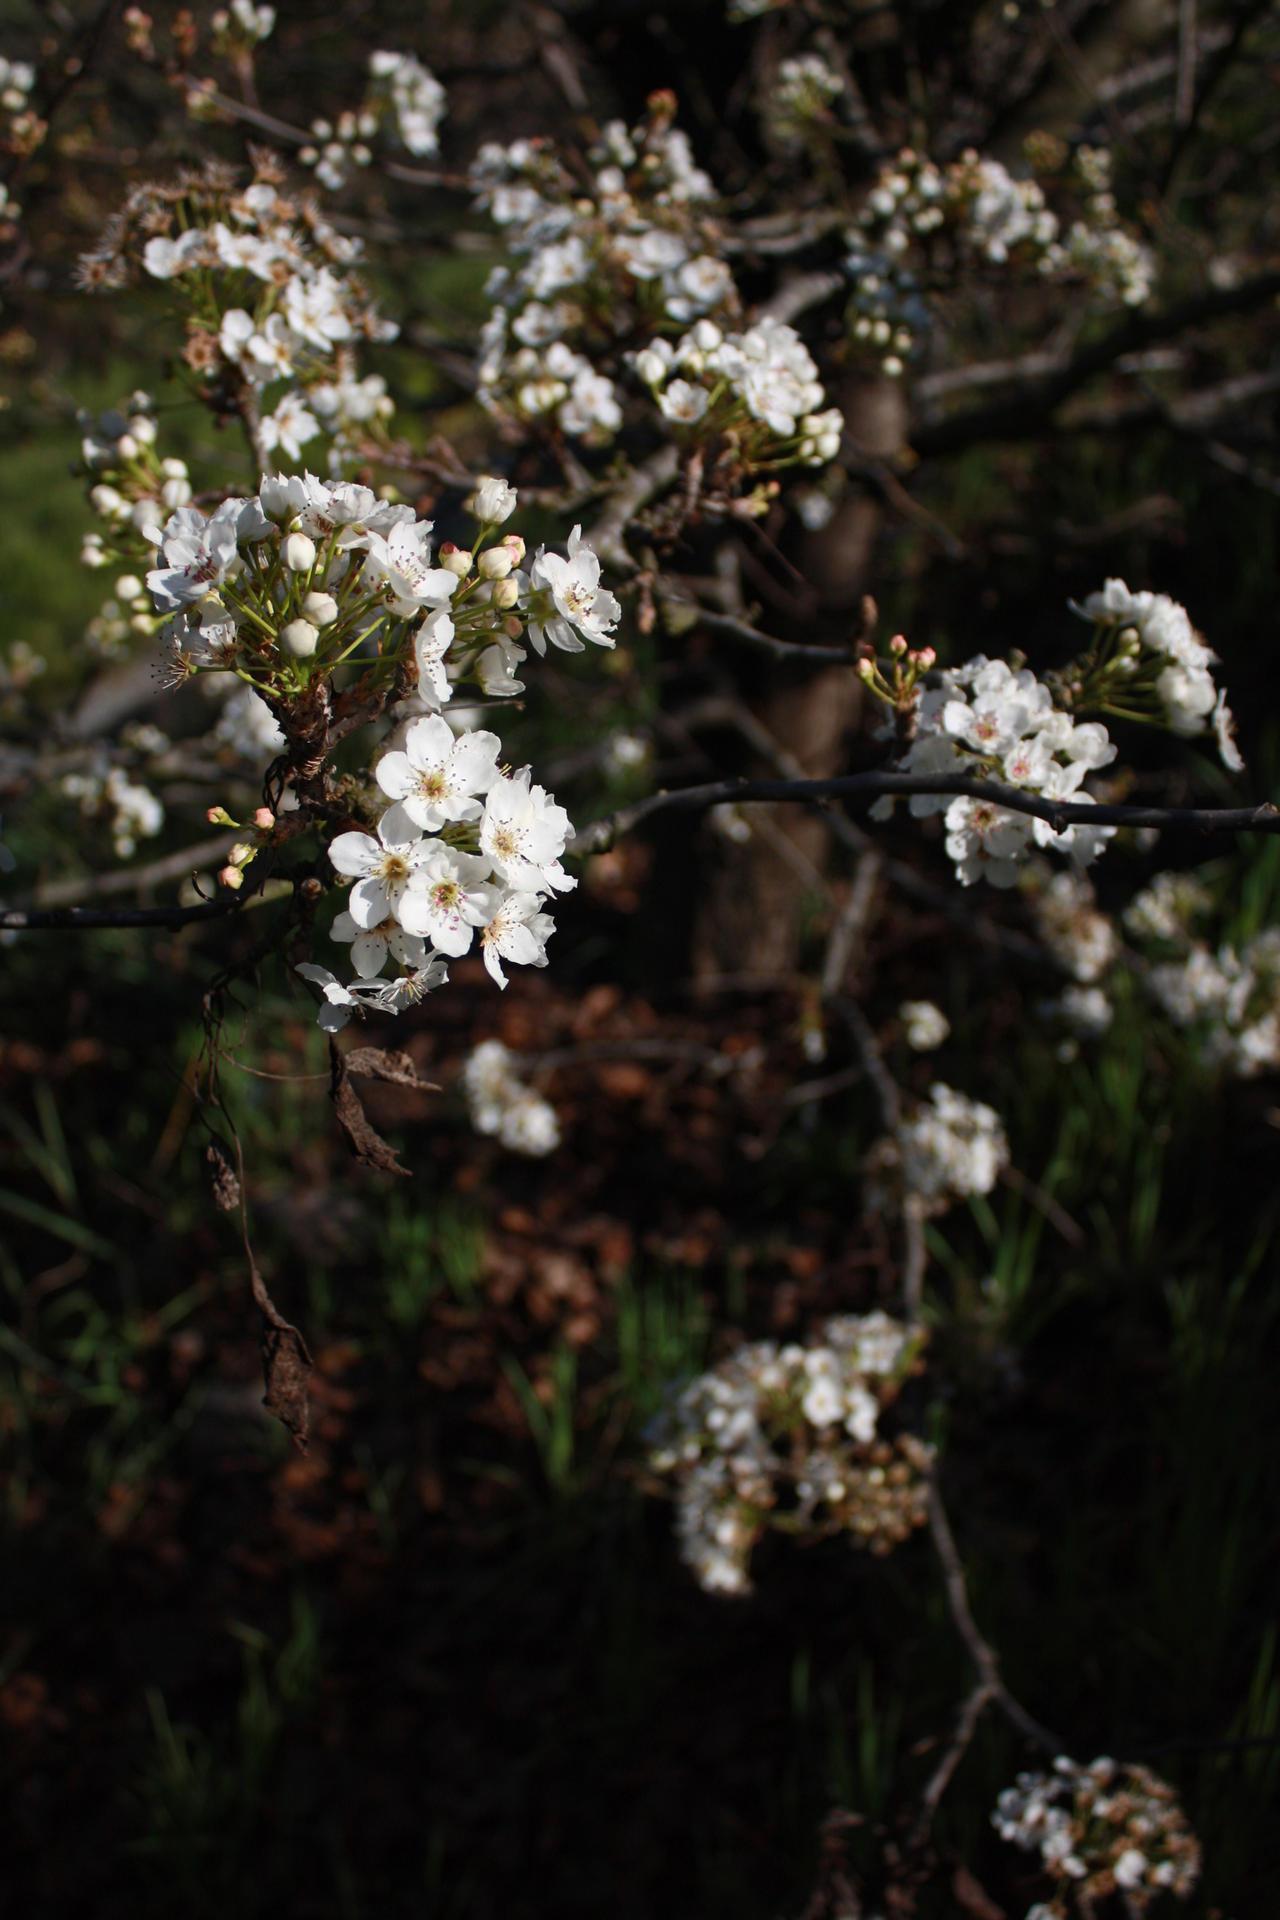 White Tree Flowers 2 by Reitanna Seishin on DeviantArt